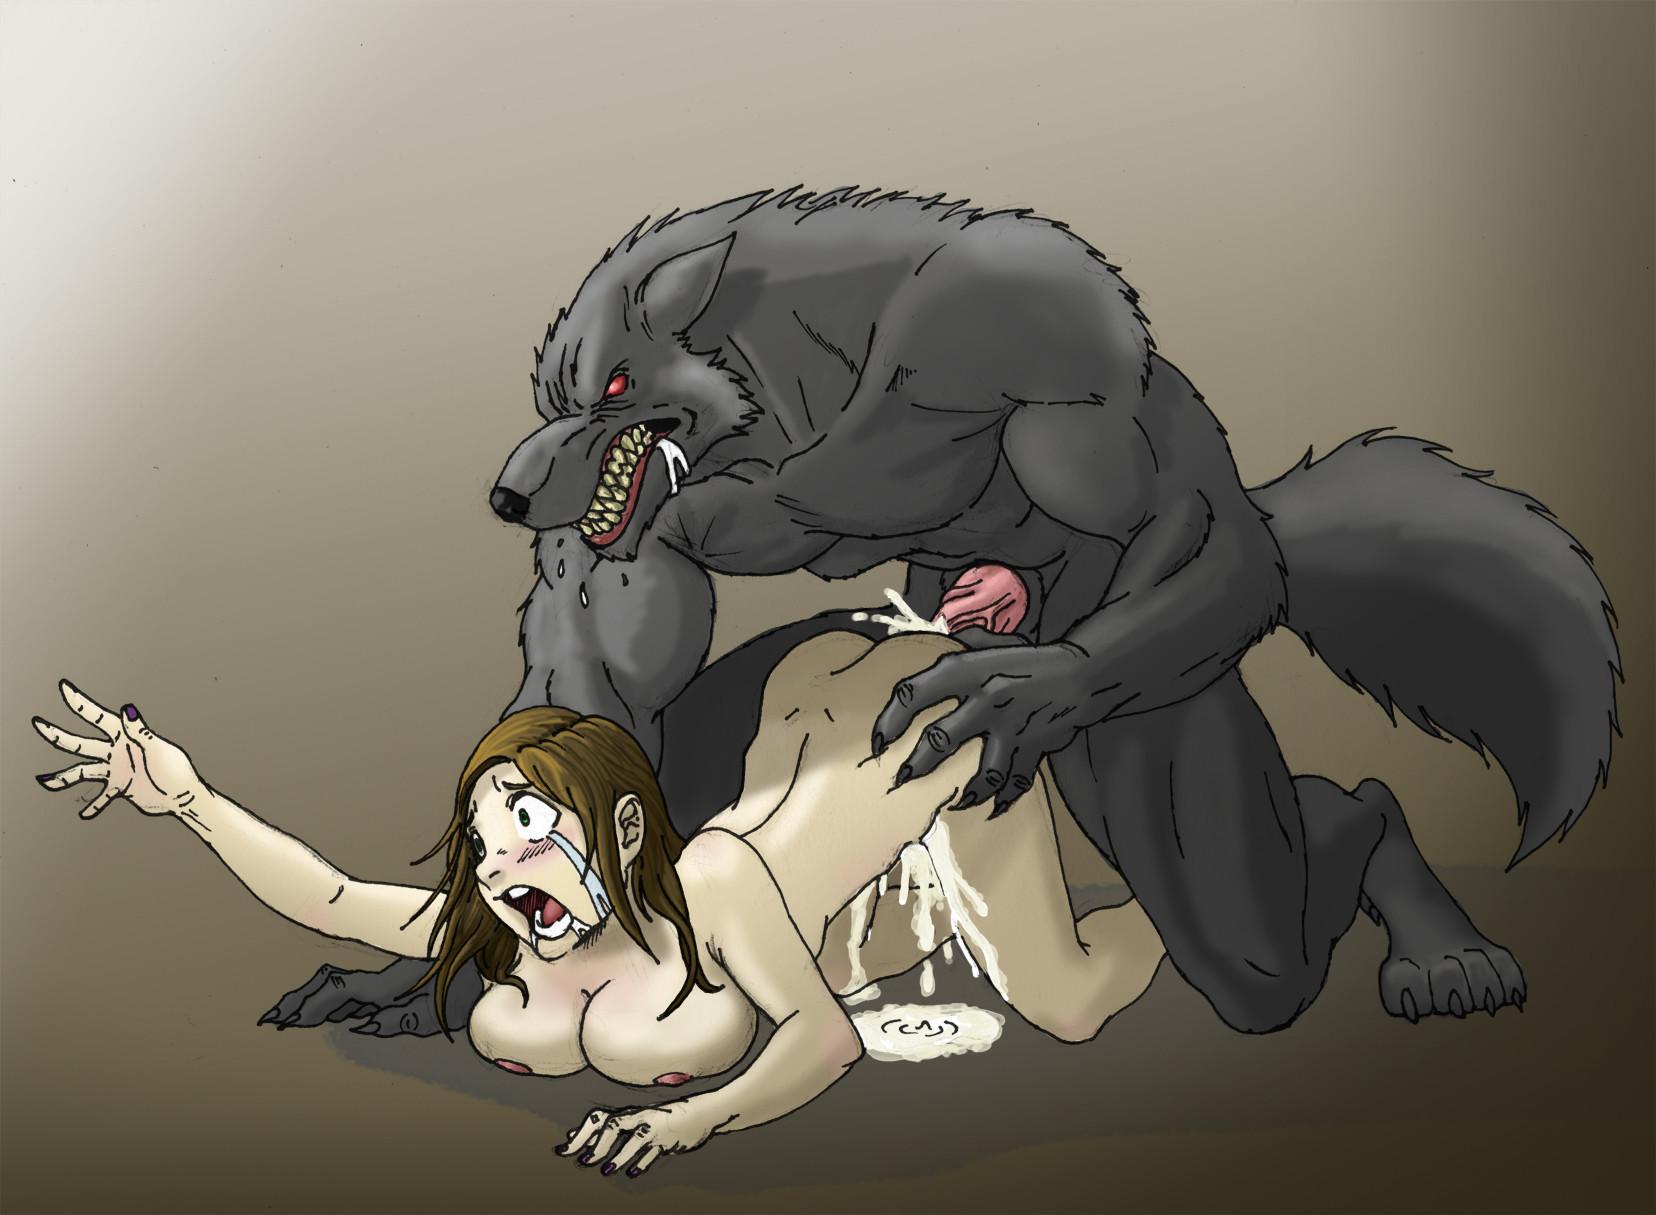 секс порно мультики секс с оборотнями